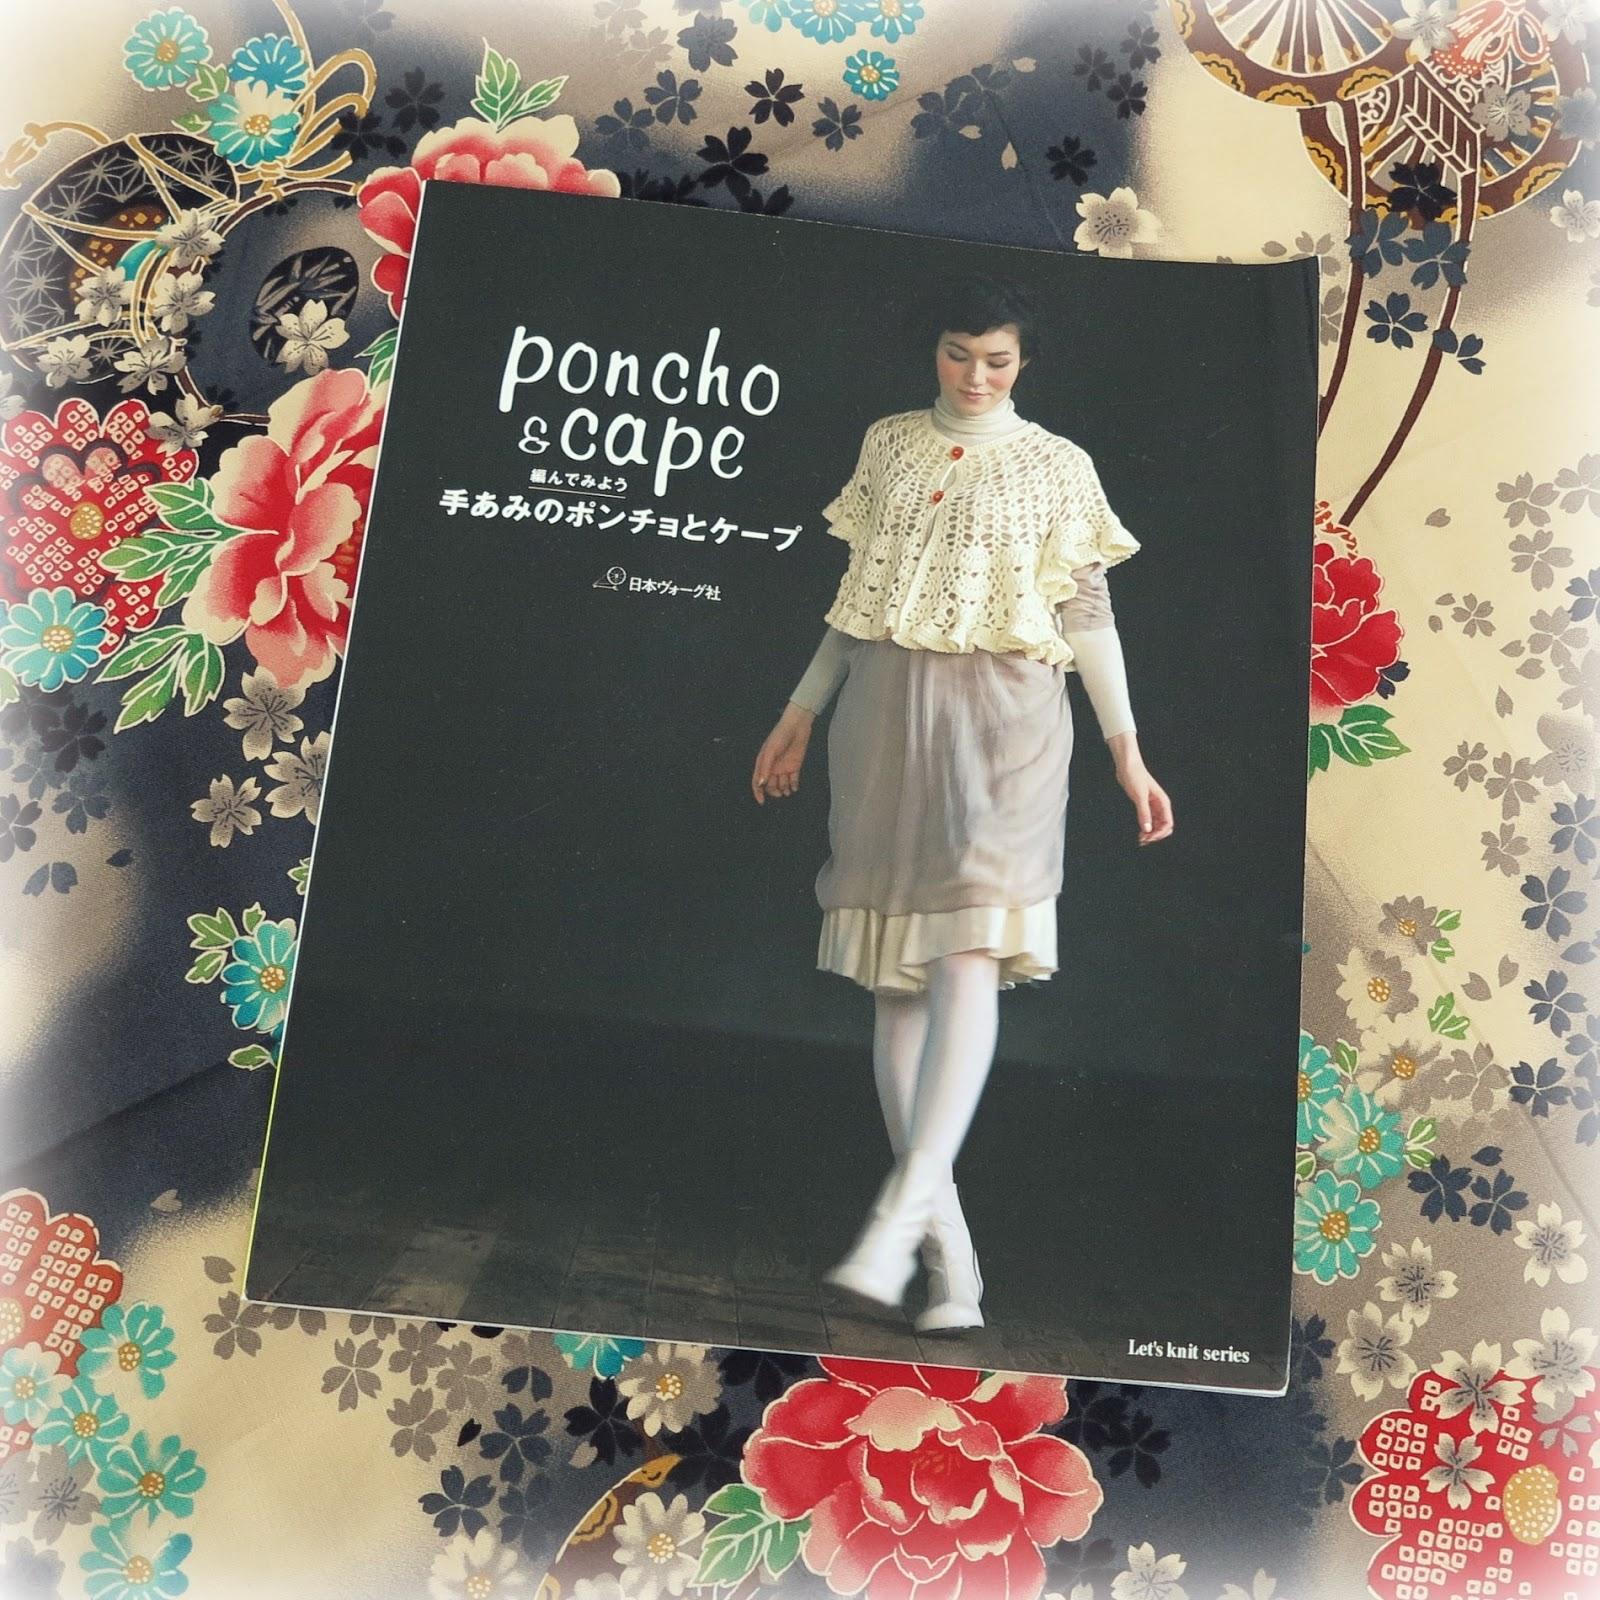 ByHaafner, japanese crochet book, poncho & cape